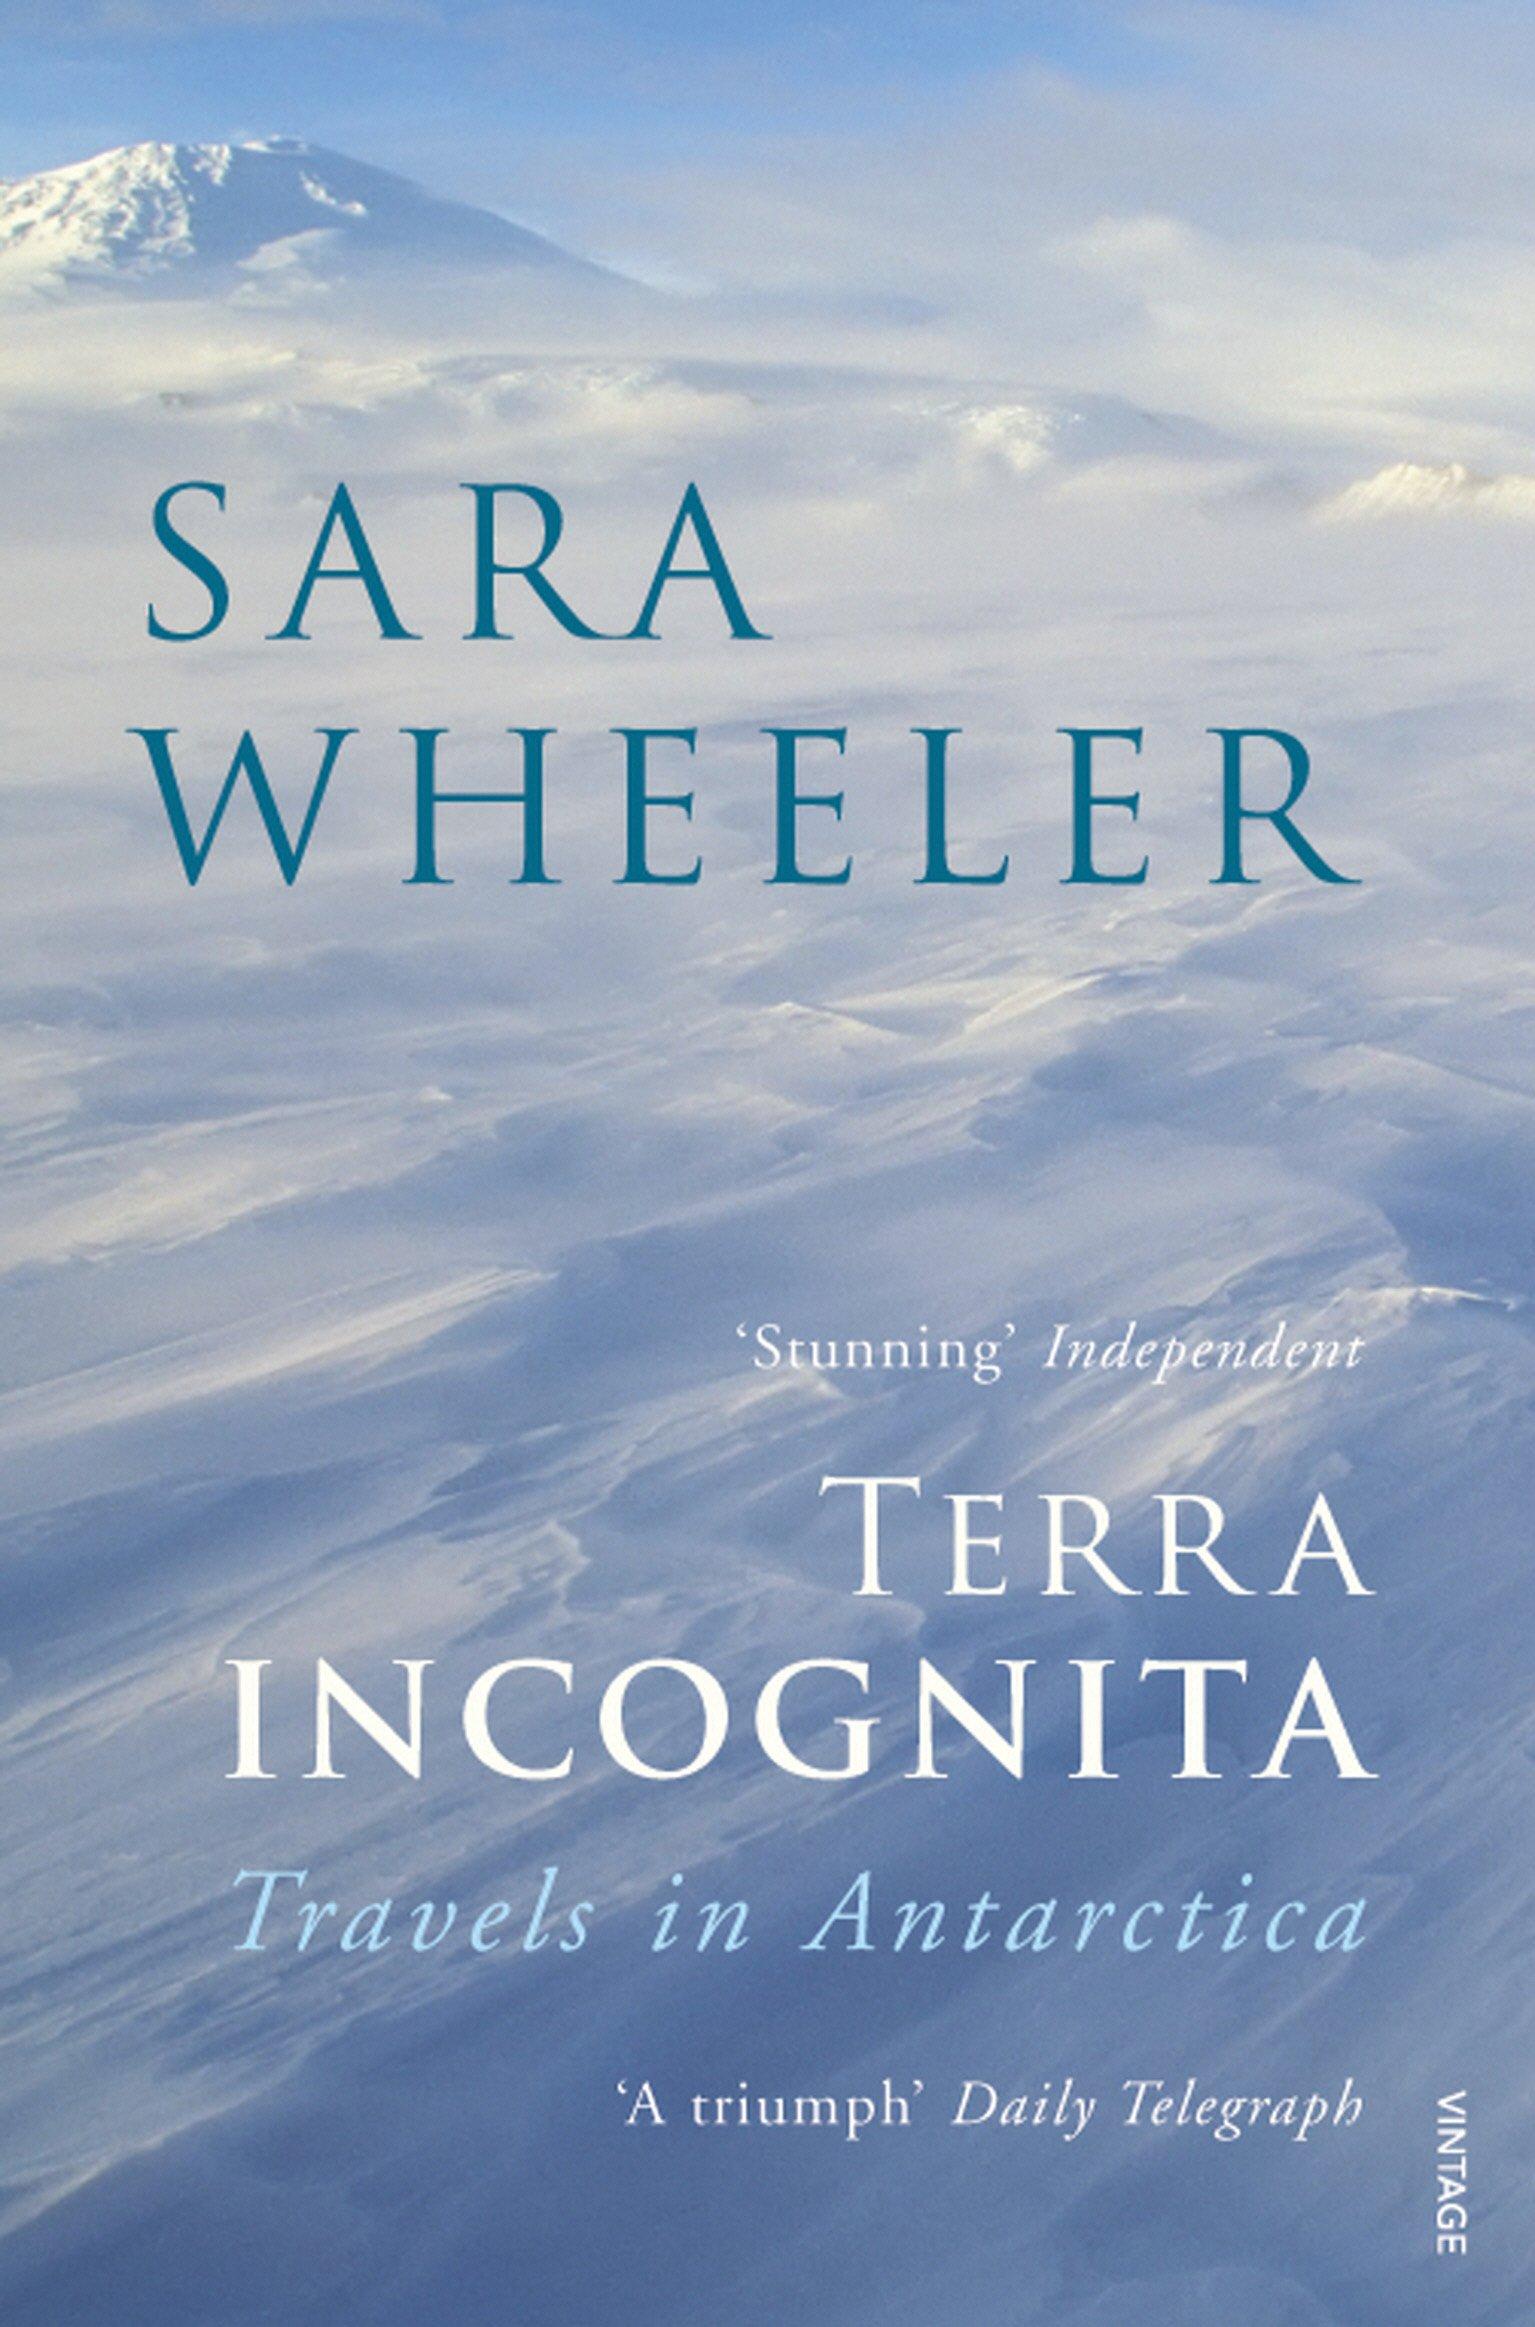 terra-incognita-travels-in-antarctica-roman